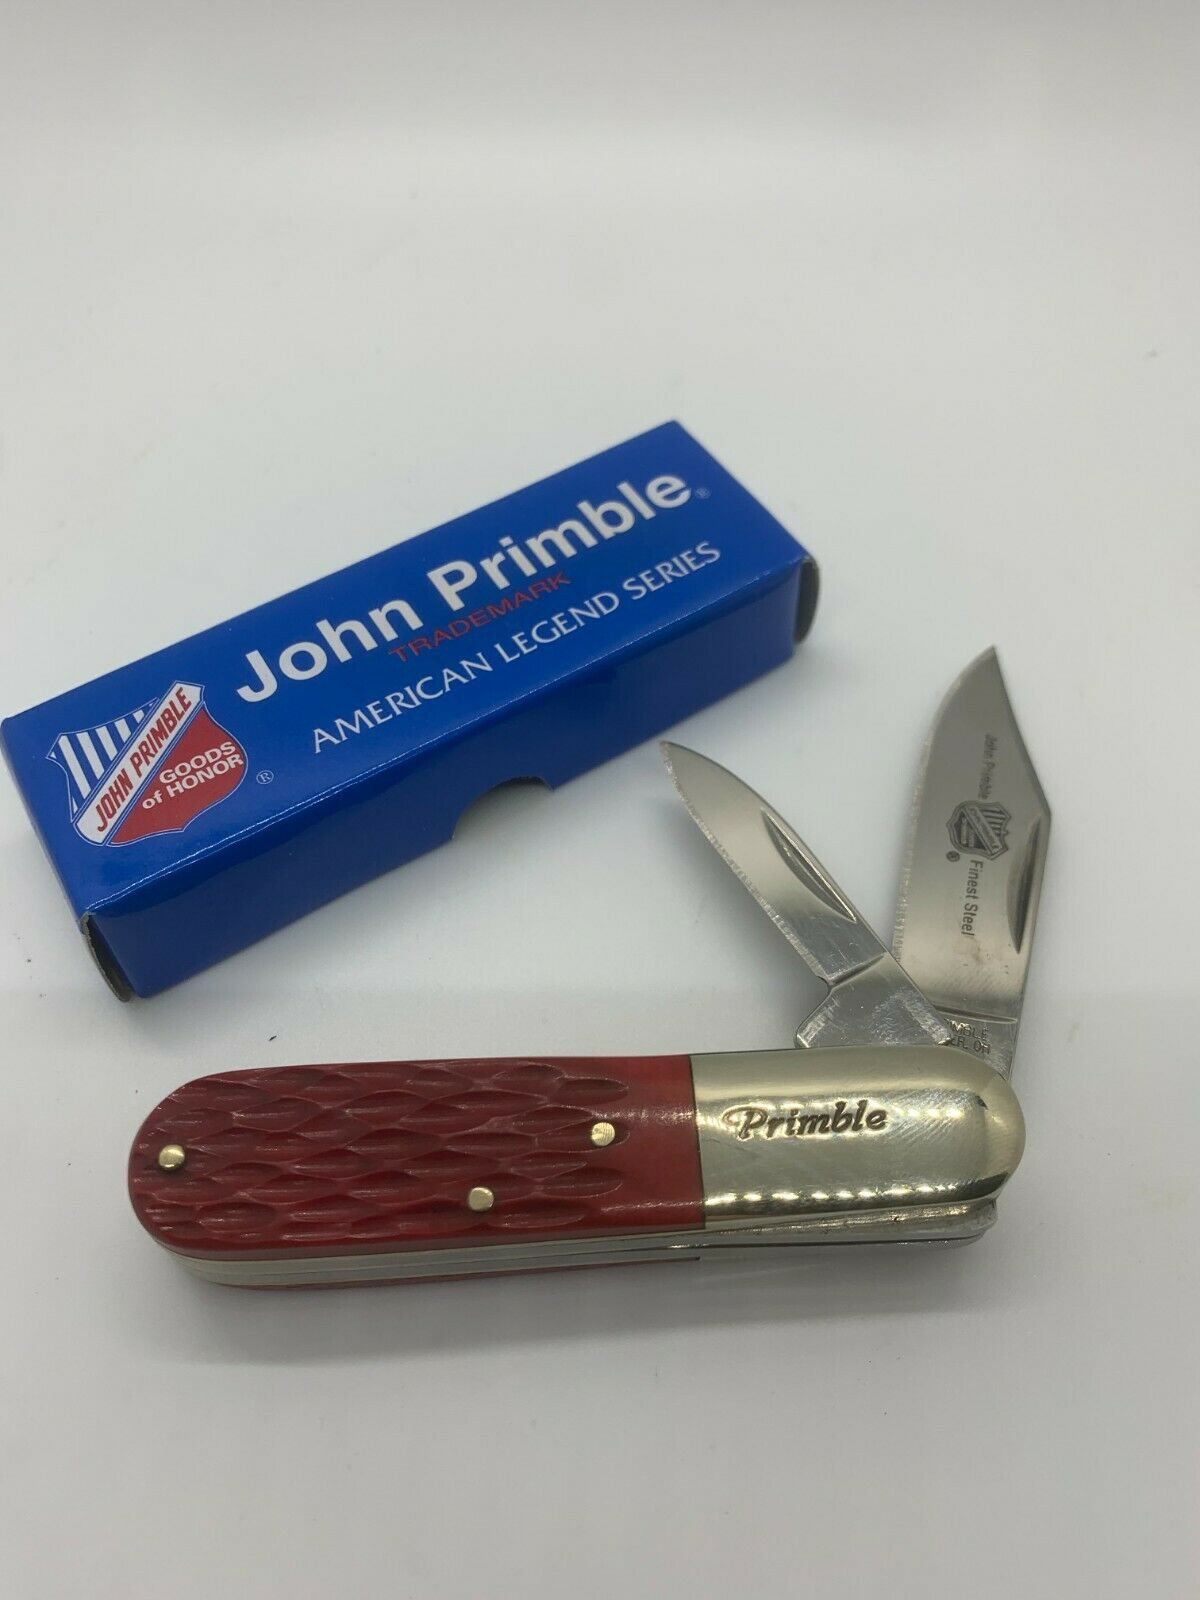 JOHN PRIMBLE 2-BLADED BARLOW KNIFE - RED JIGGED BONE - JP 30 0020RJB - NIB